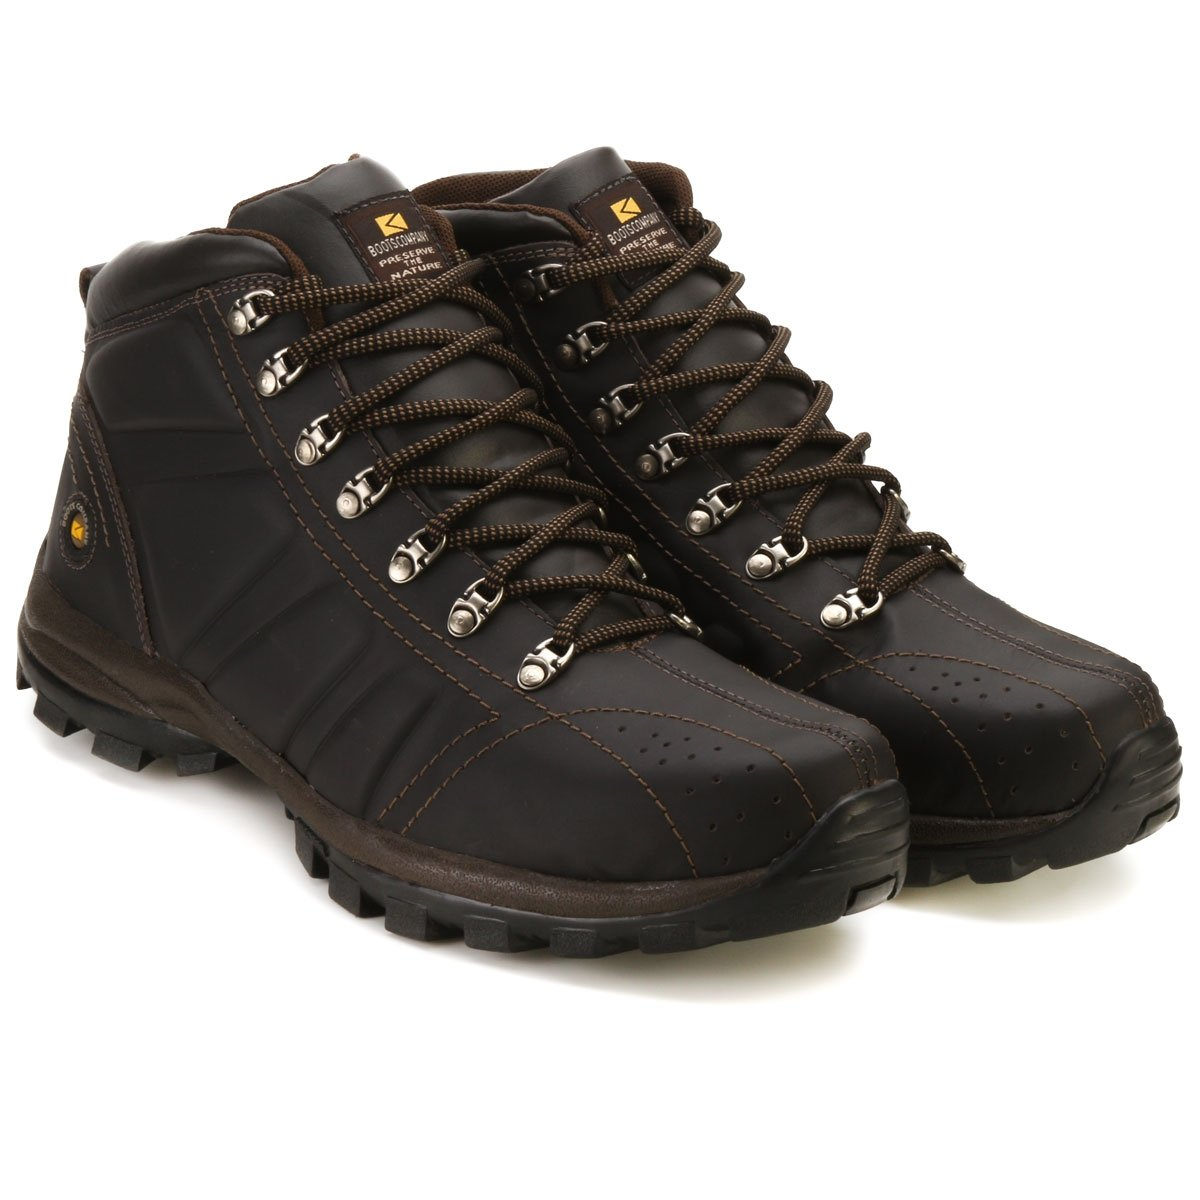 Boots Bota Bota Boots Café Company Boots Seq Bota Company XT Seq Café XT Company Seq ExqTYCHxw